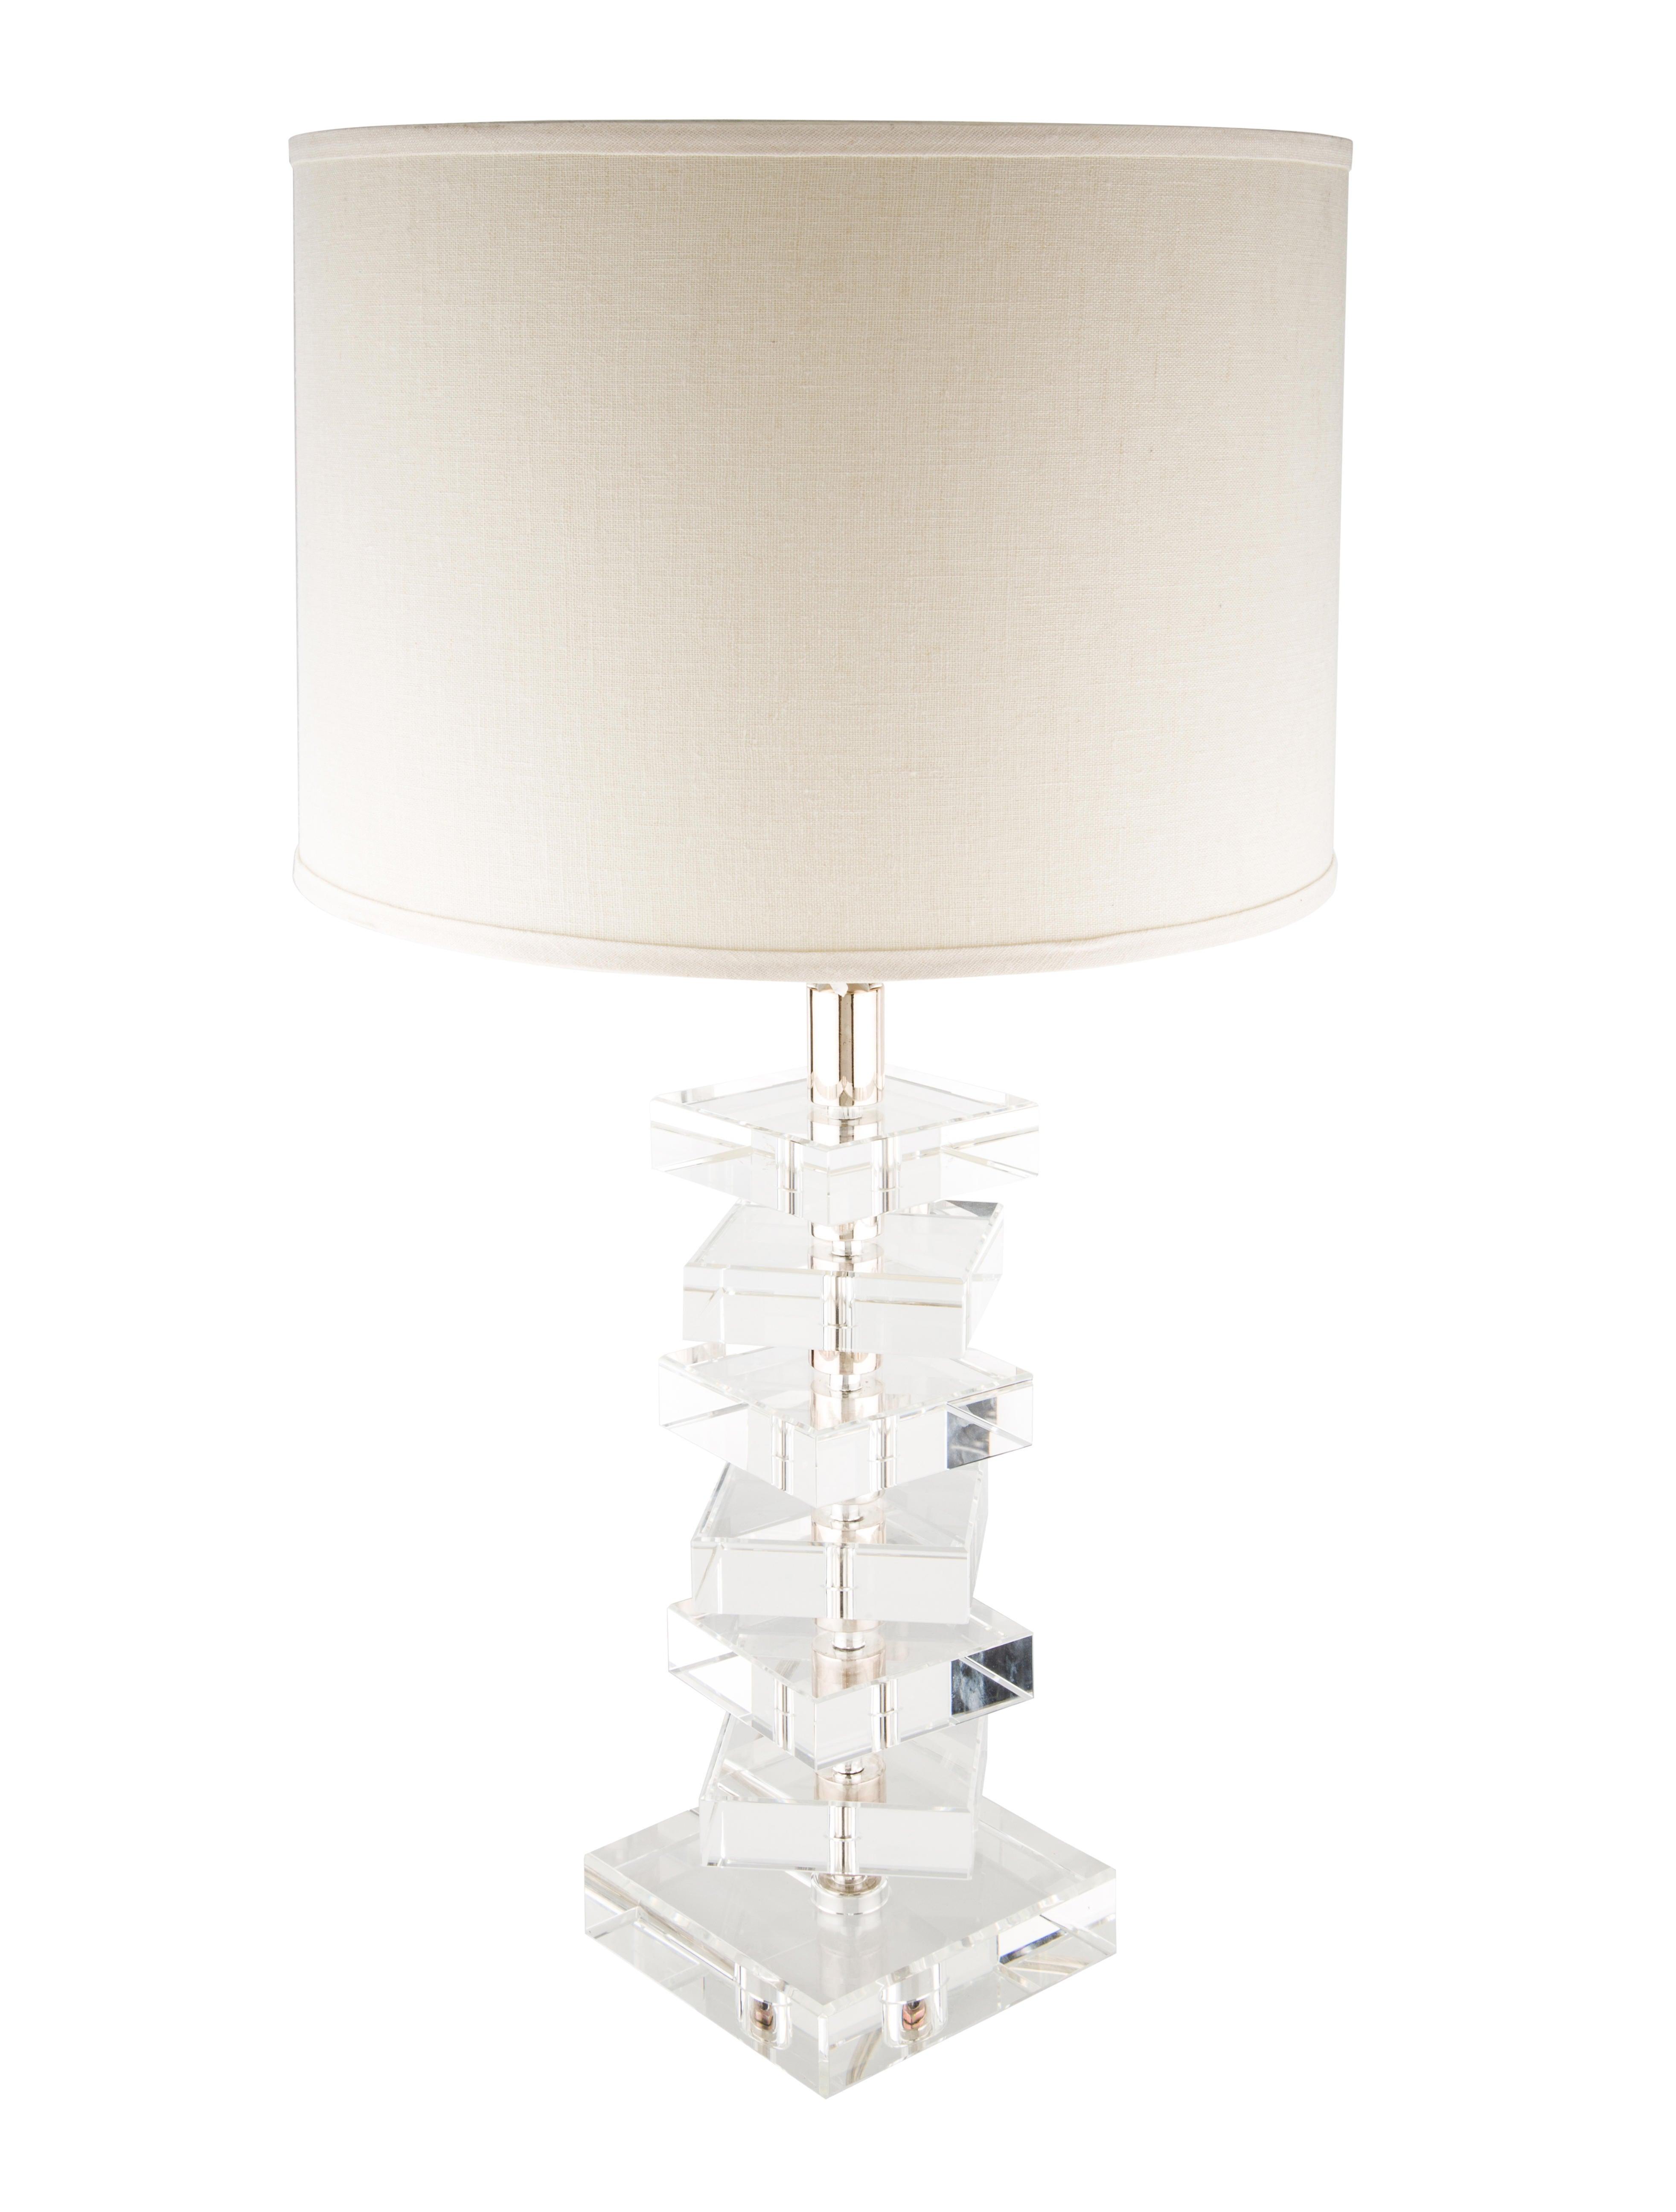 robert abbey table lamp  lighting  lghti  the realreal - robert abbey table lamp